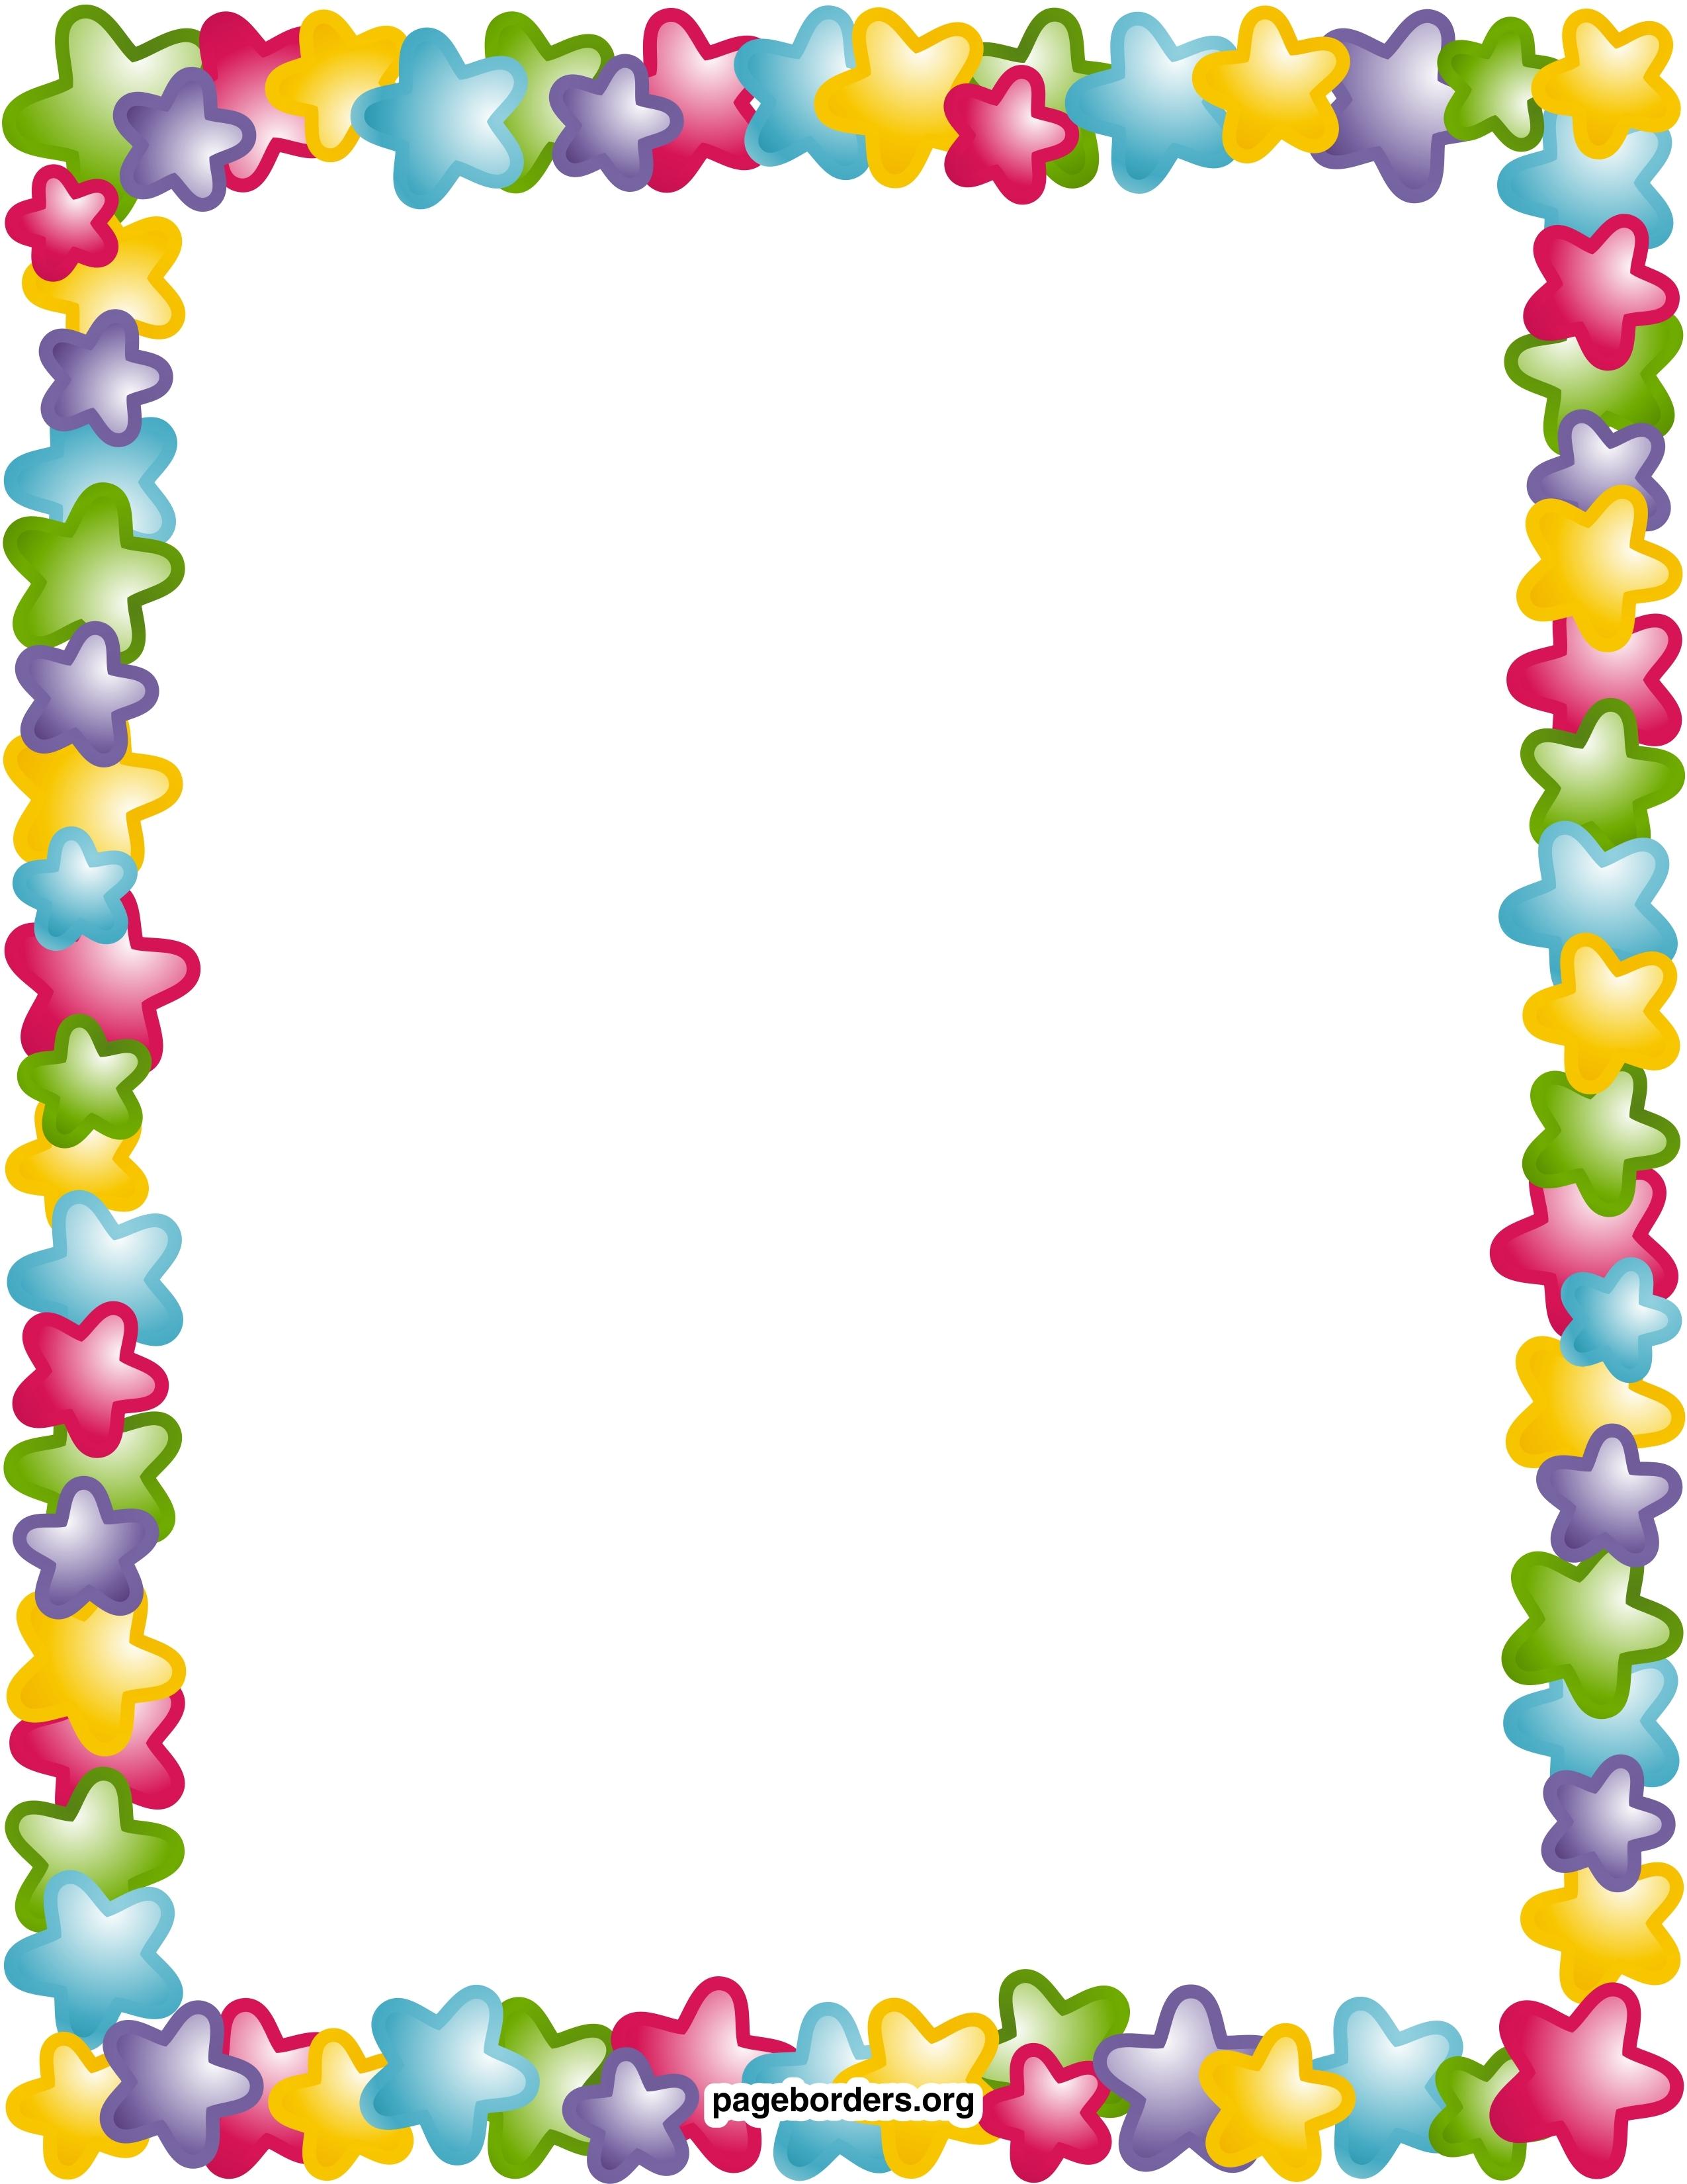 Simple Line Border Clipart Panda Free Clipart Images   Clip art borders,  Free clip art, Free clipart images